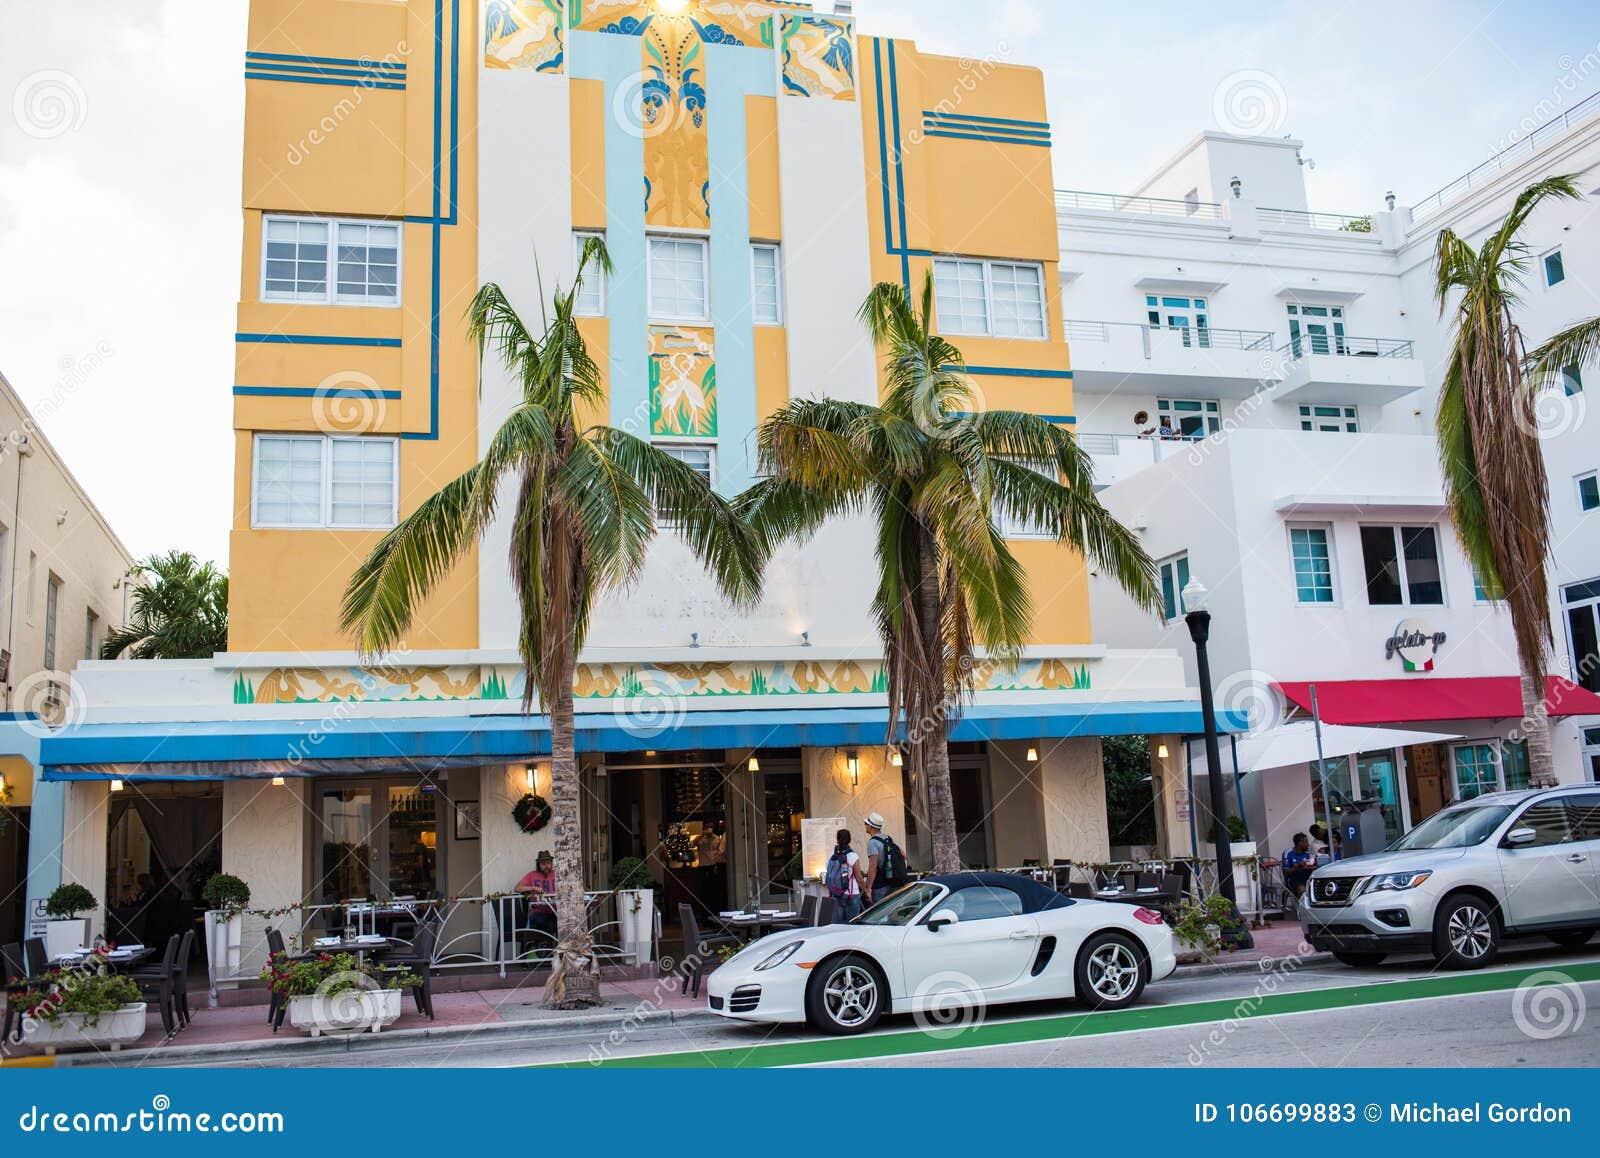 art deco building in miami beach florida editorial stock photo